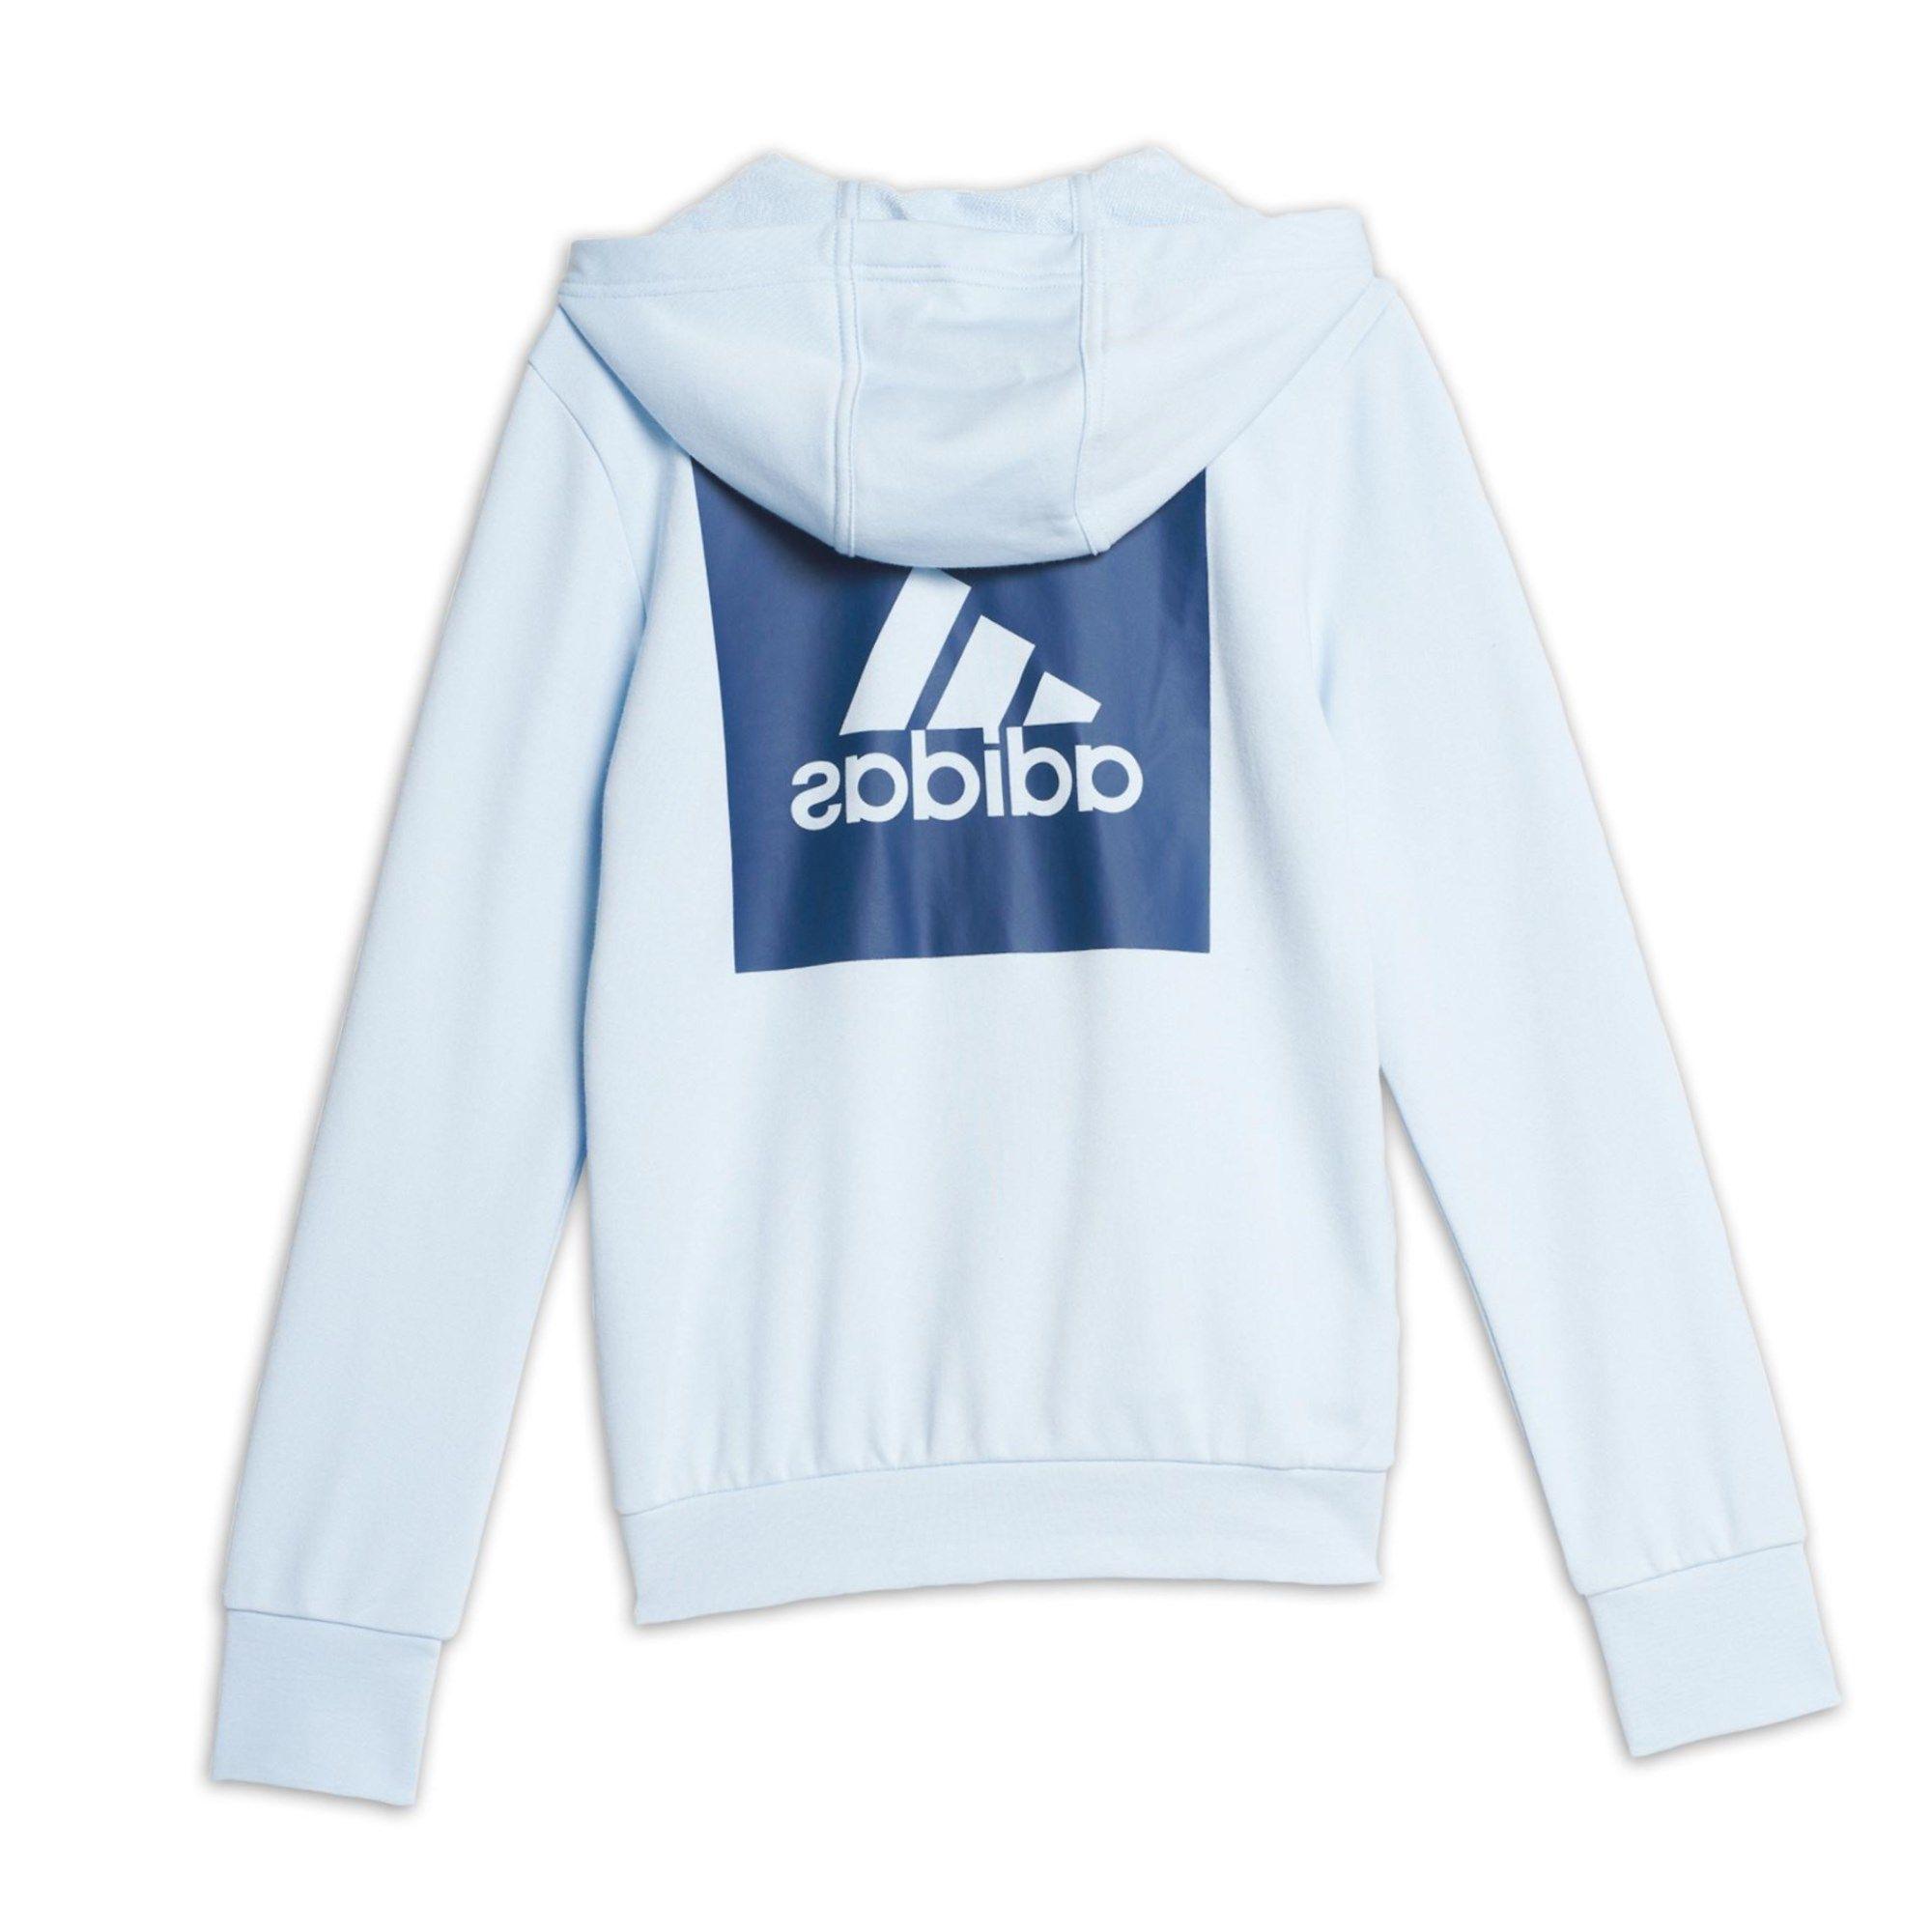 Adidas hausanzug. | Hausanzug, Jogginganzug und Trainingsanzug